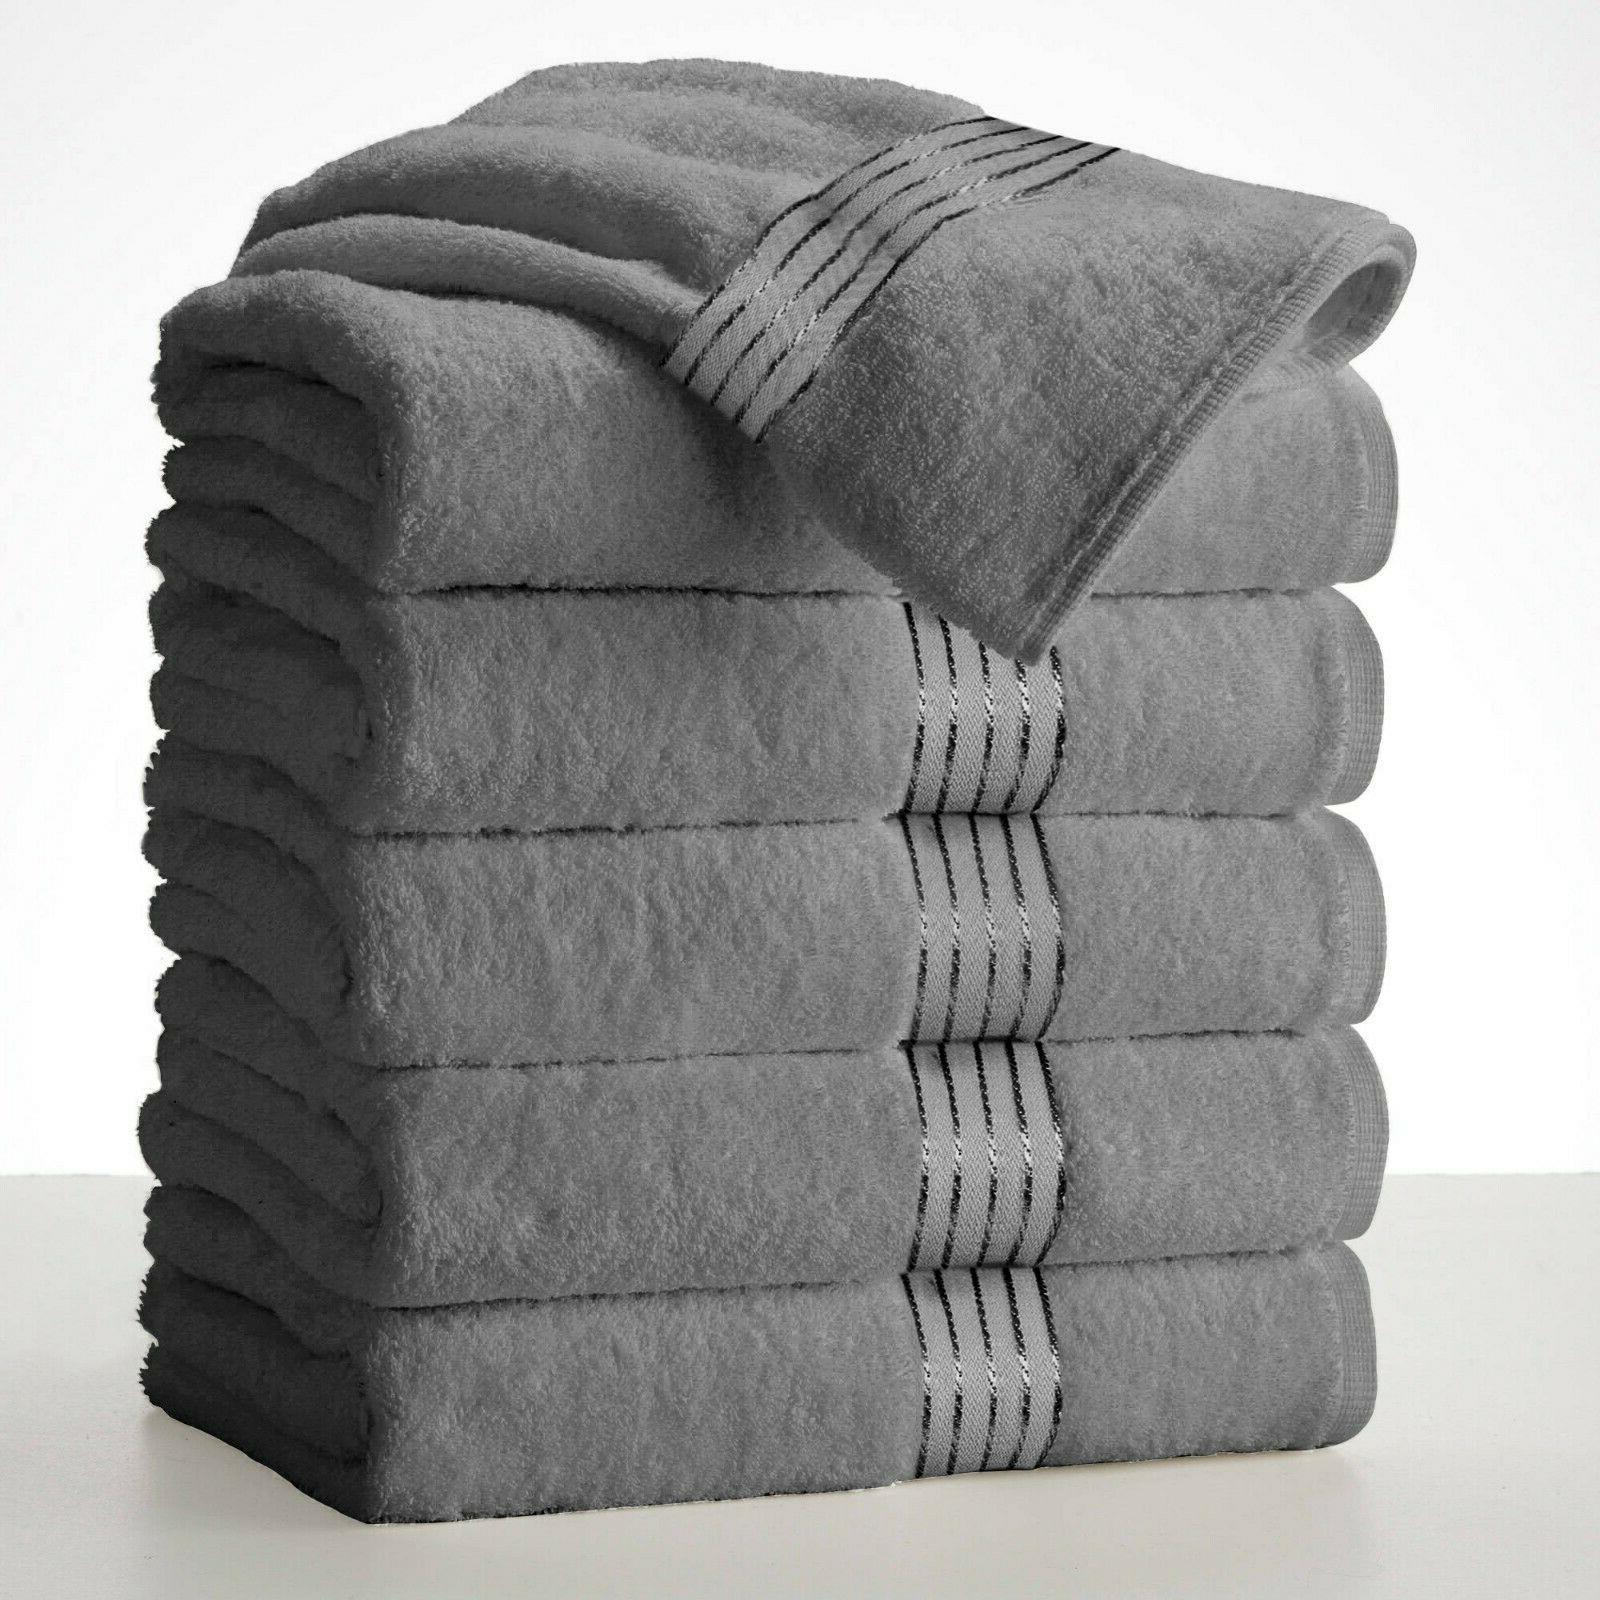 "Large Bath Towel Sets Sheets 27""x58"" 450 Absorbent"